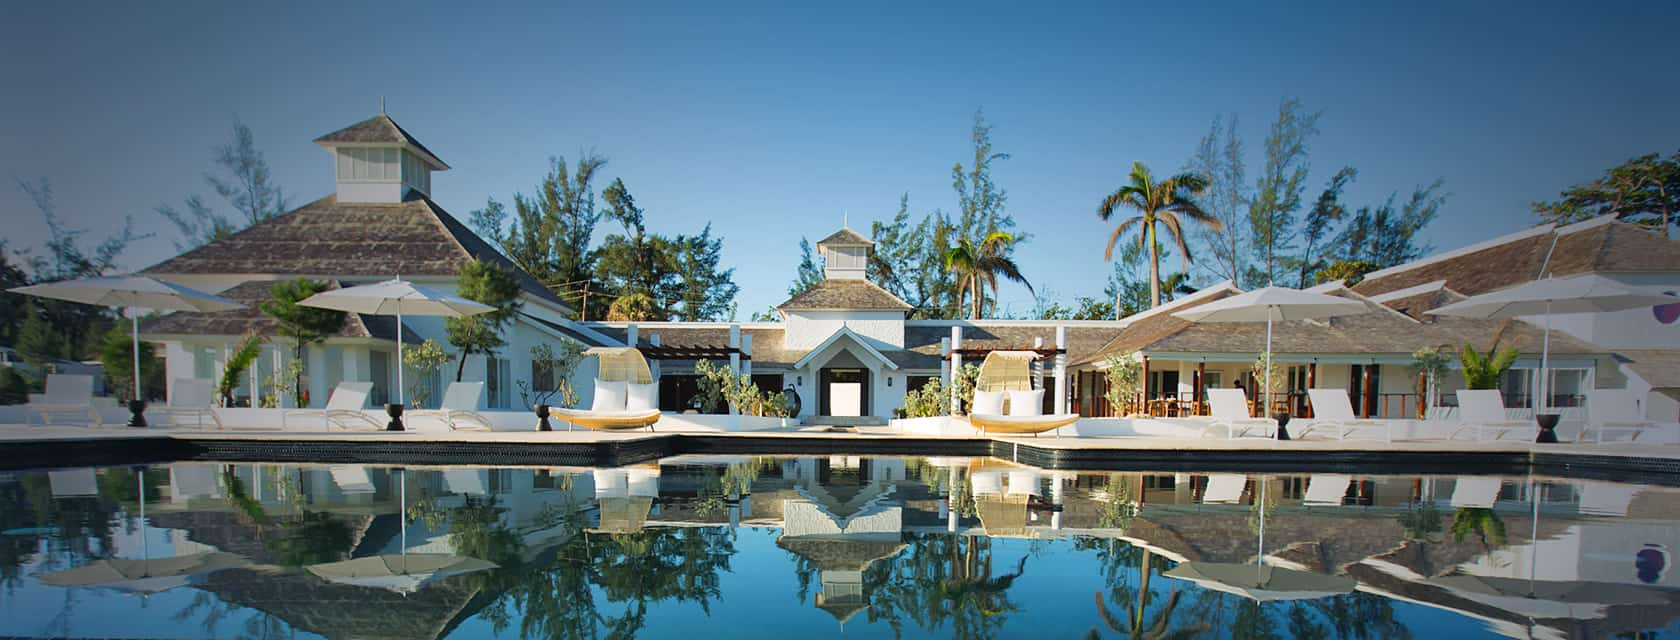 best jamaica luxury hotel trident villas in port antonio portland caribbean. Black Bedroom Furniture Sets. Home Design Ideas